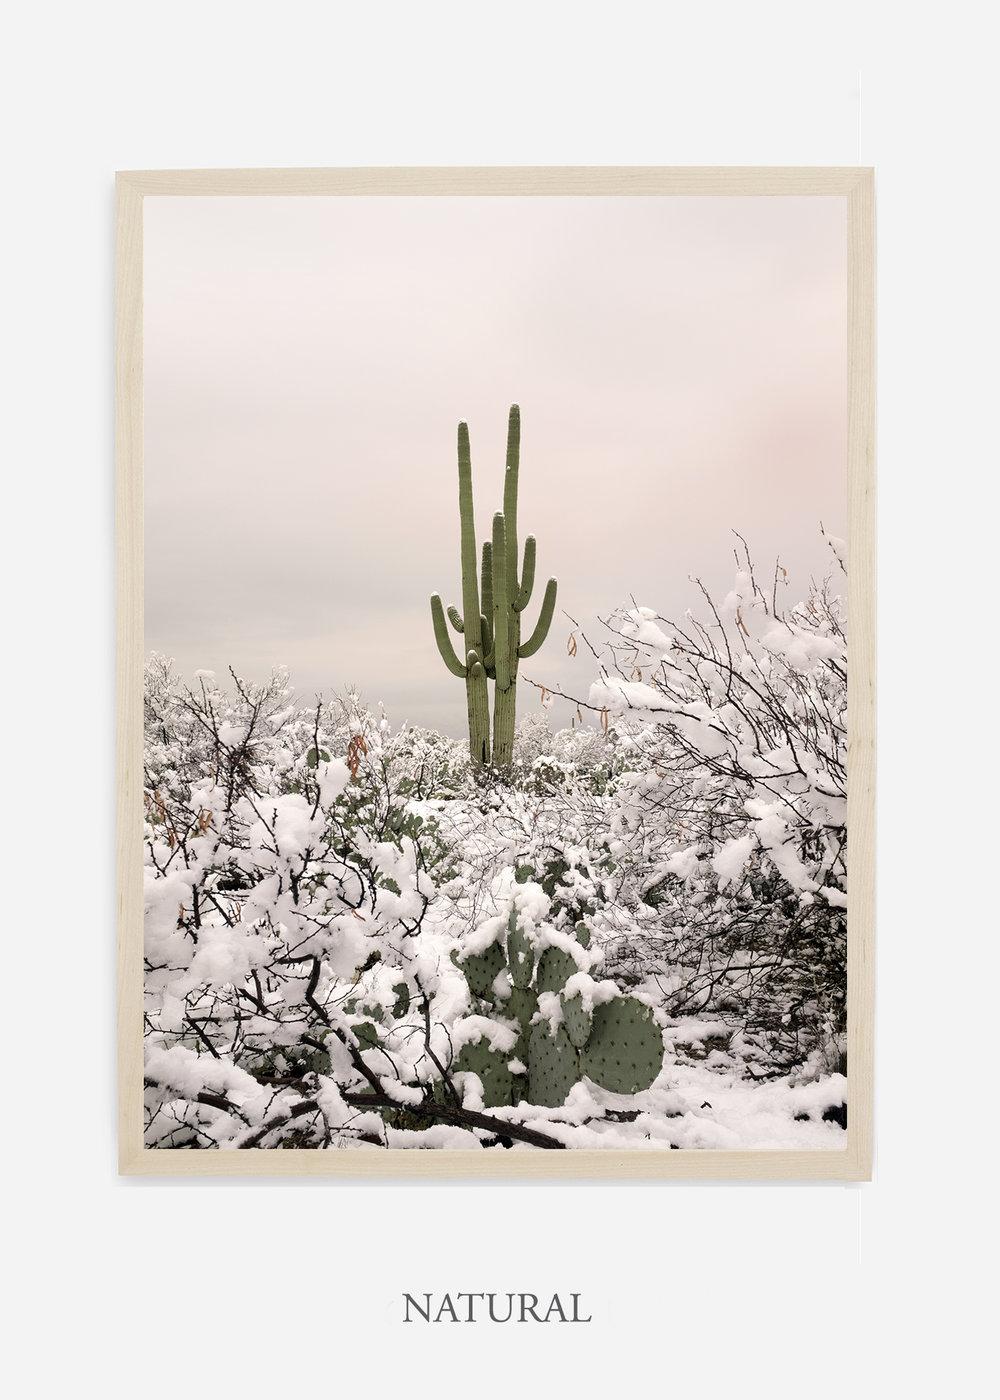 nomat-naturalframe-saguaroNo.2-wildercalifornia-art-wallart-cactusprint-homedecor-prints-arizona-botanical-artwork-interiordesign.jpg